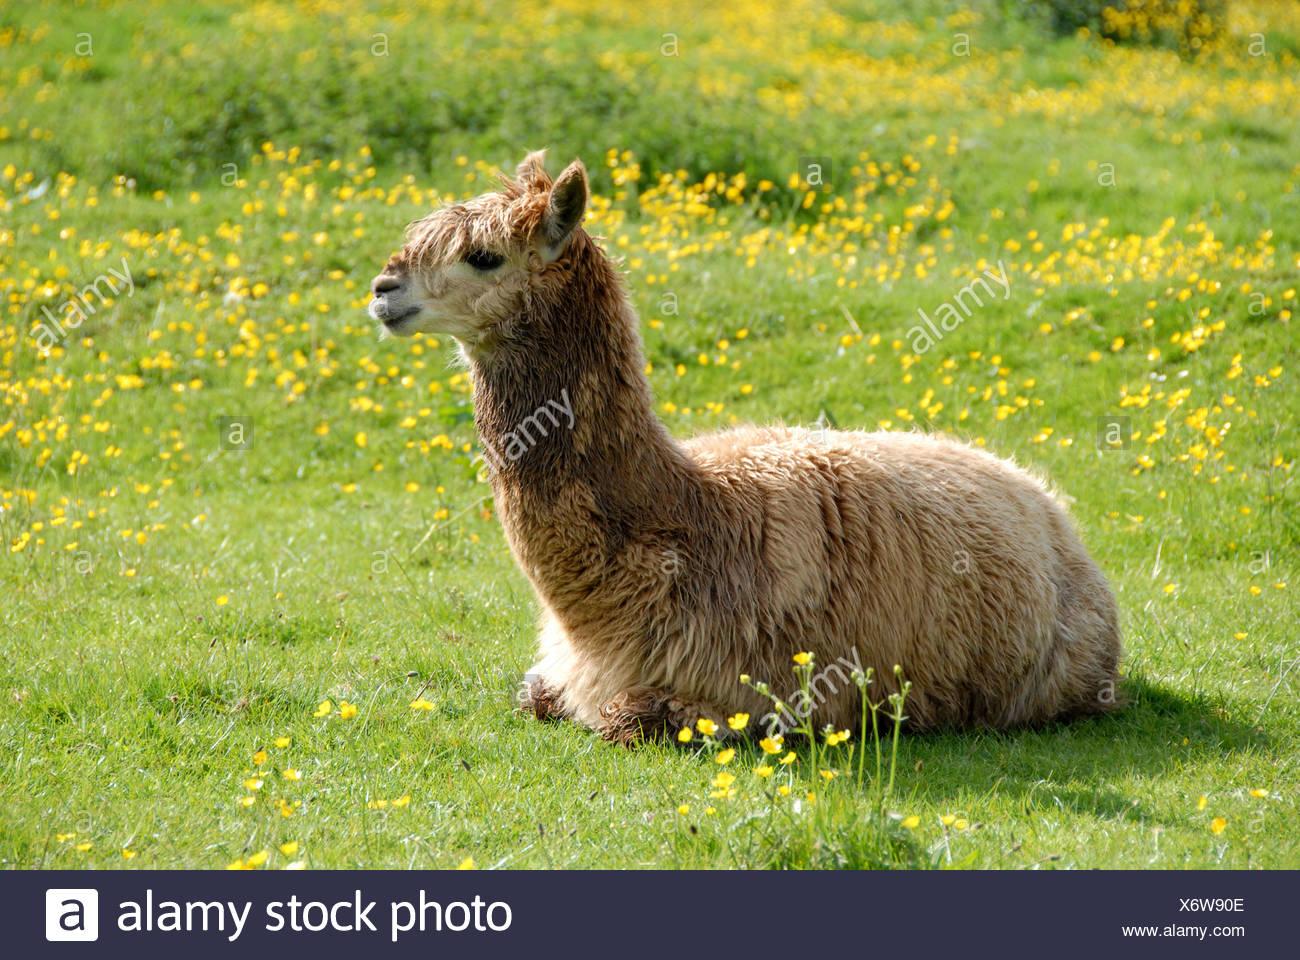 Aplaca lama pacos domestic pet meadow grass buttercups wool herbivore alpaca alpacas camelidae domestic domesticated hoofed - Stock Image